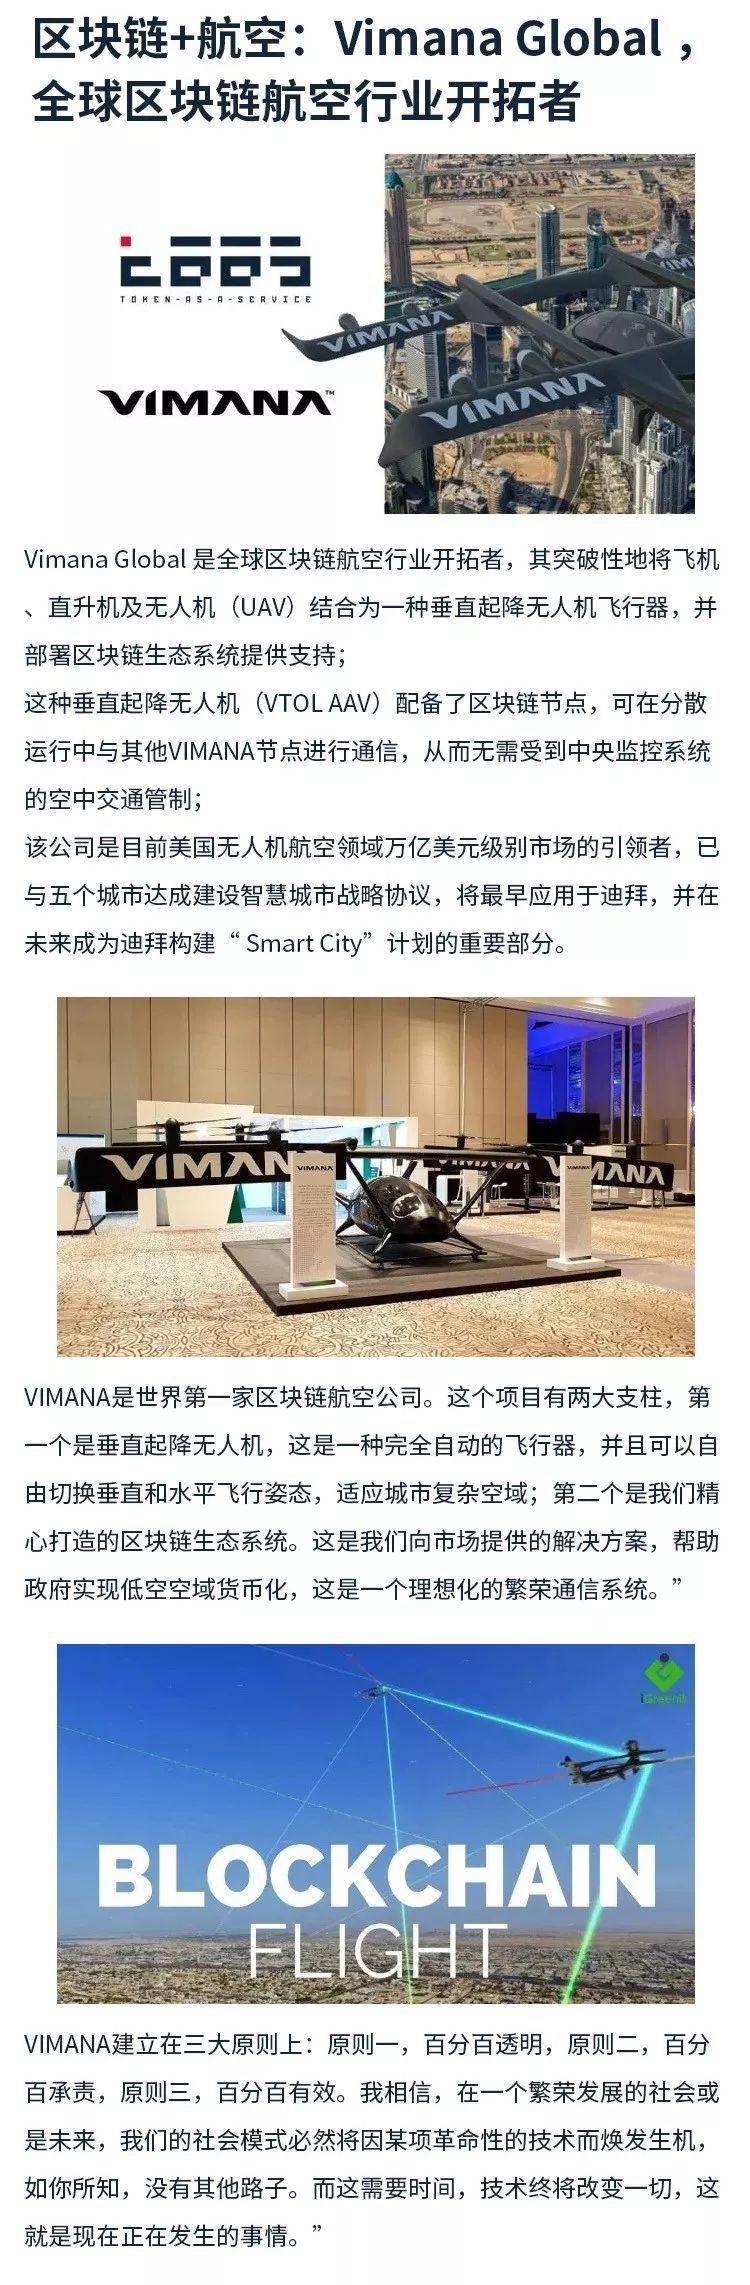 Vimana计划在迪拜推出区块链无人飞行